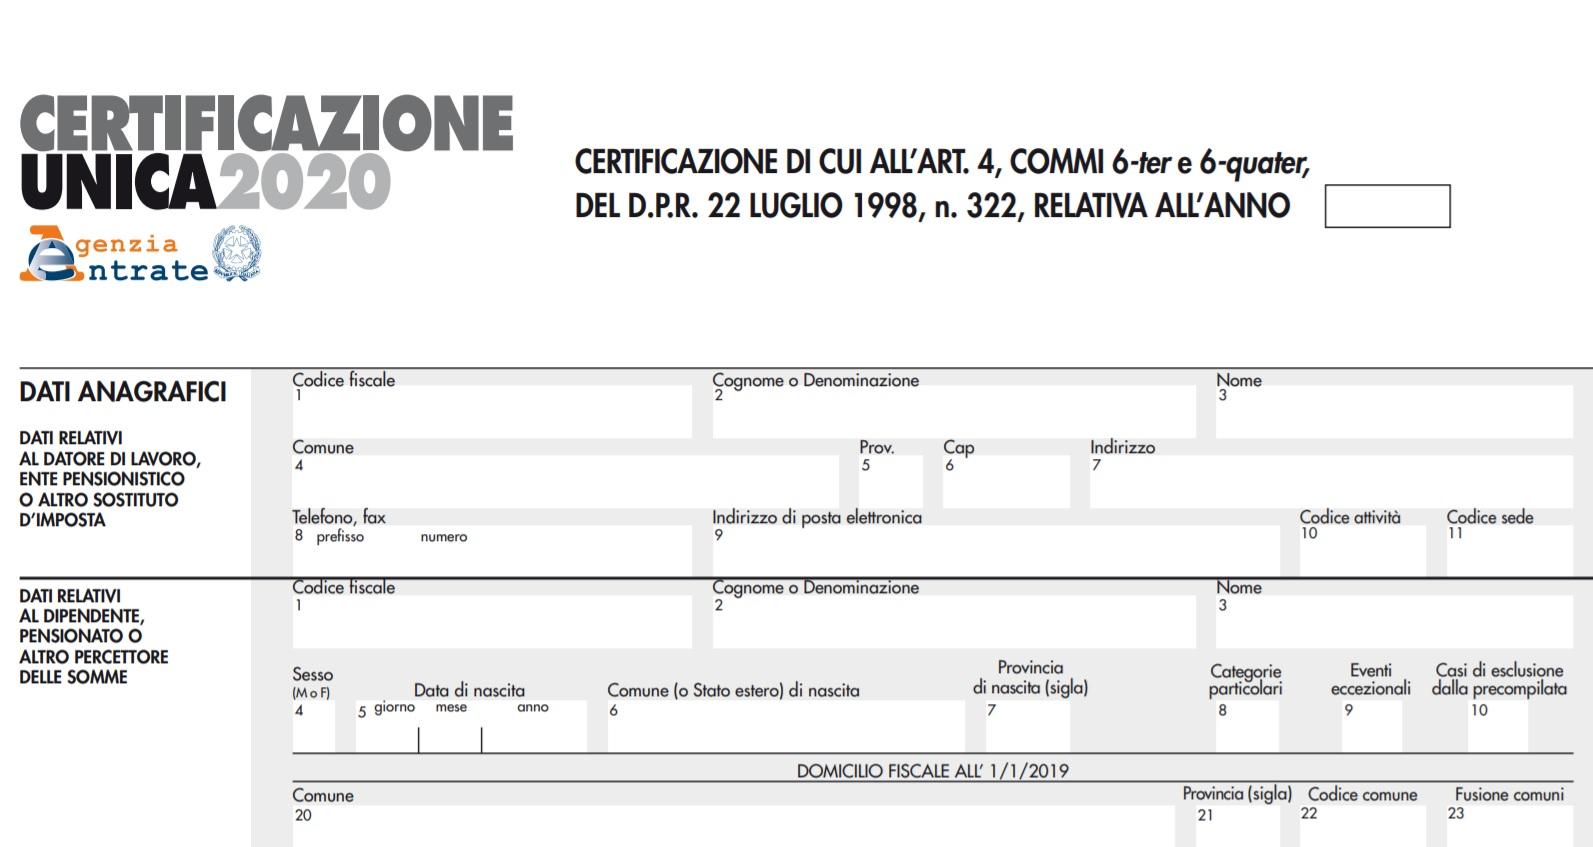 Certificazione Unica 2020 su NoiPa